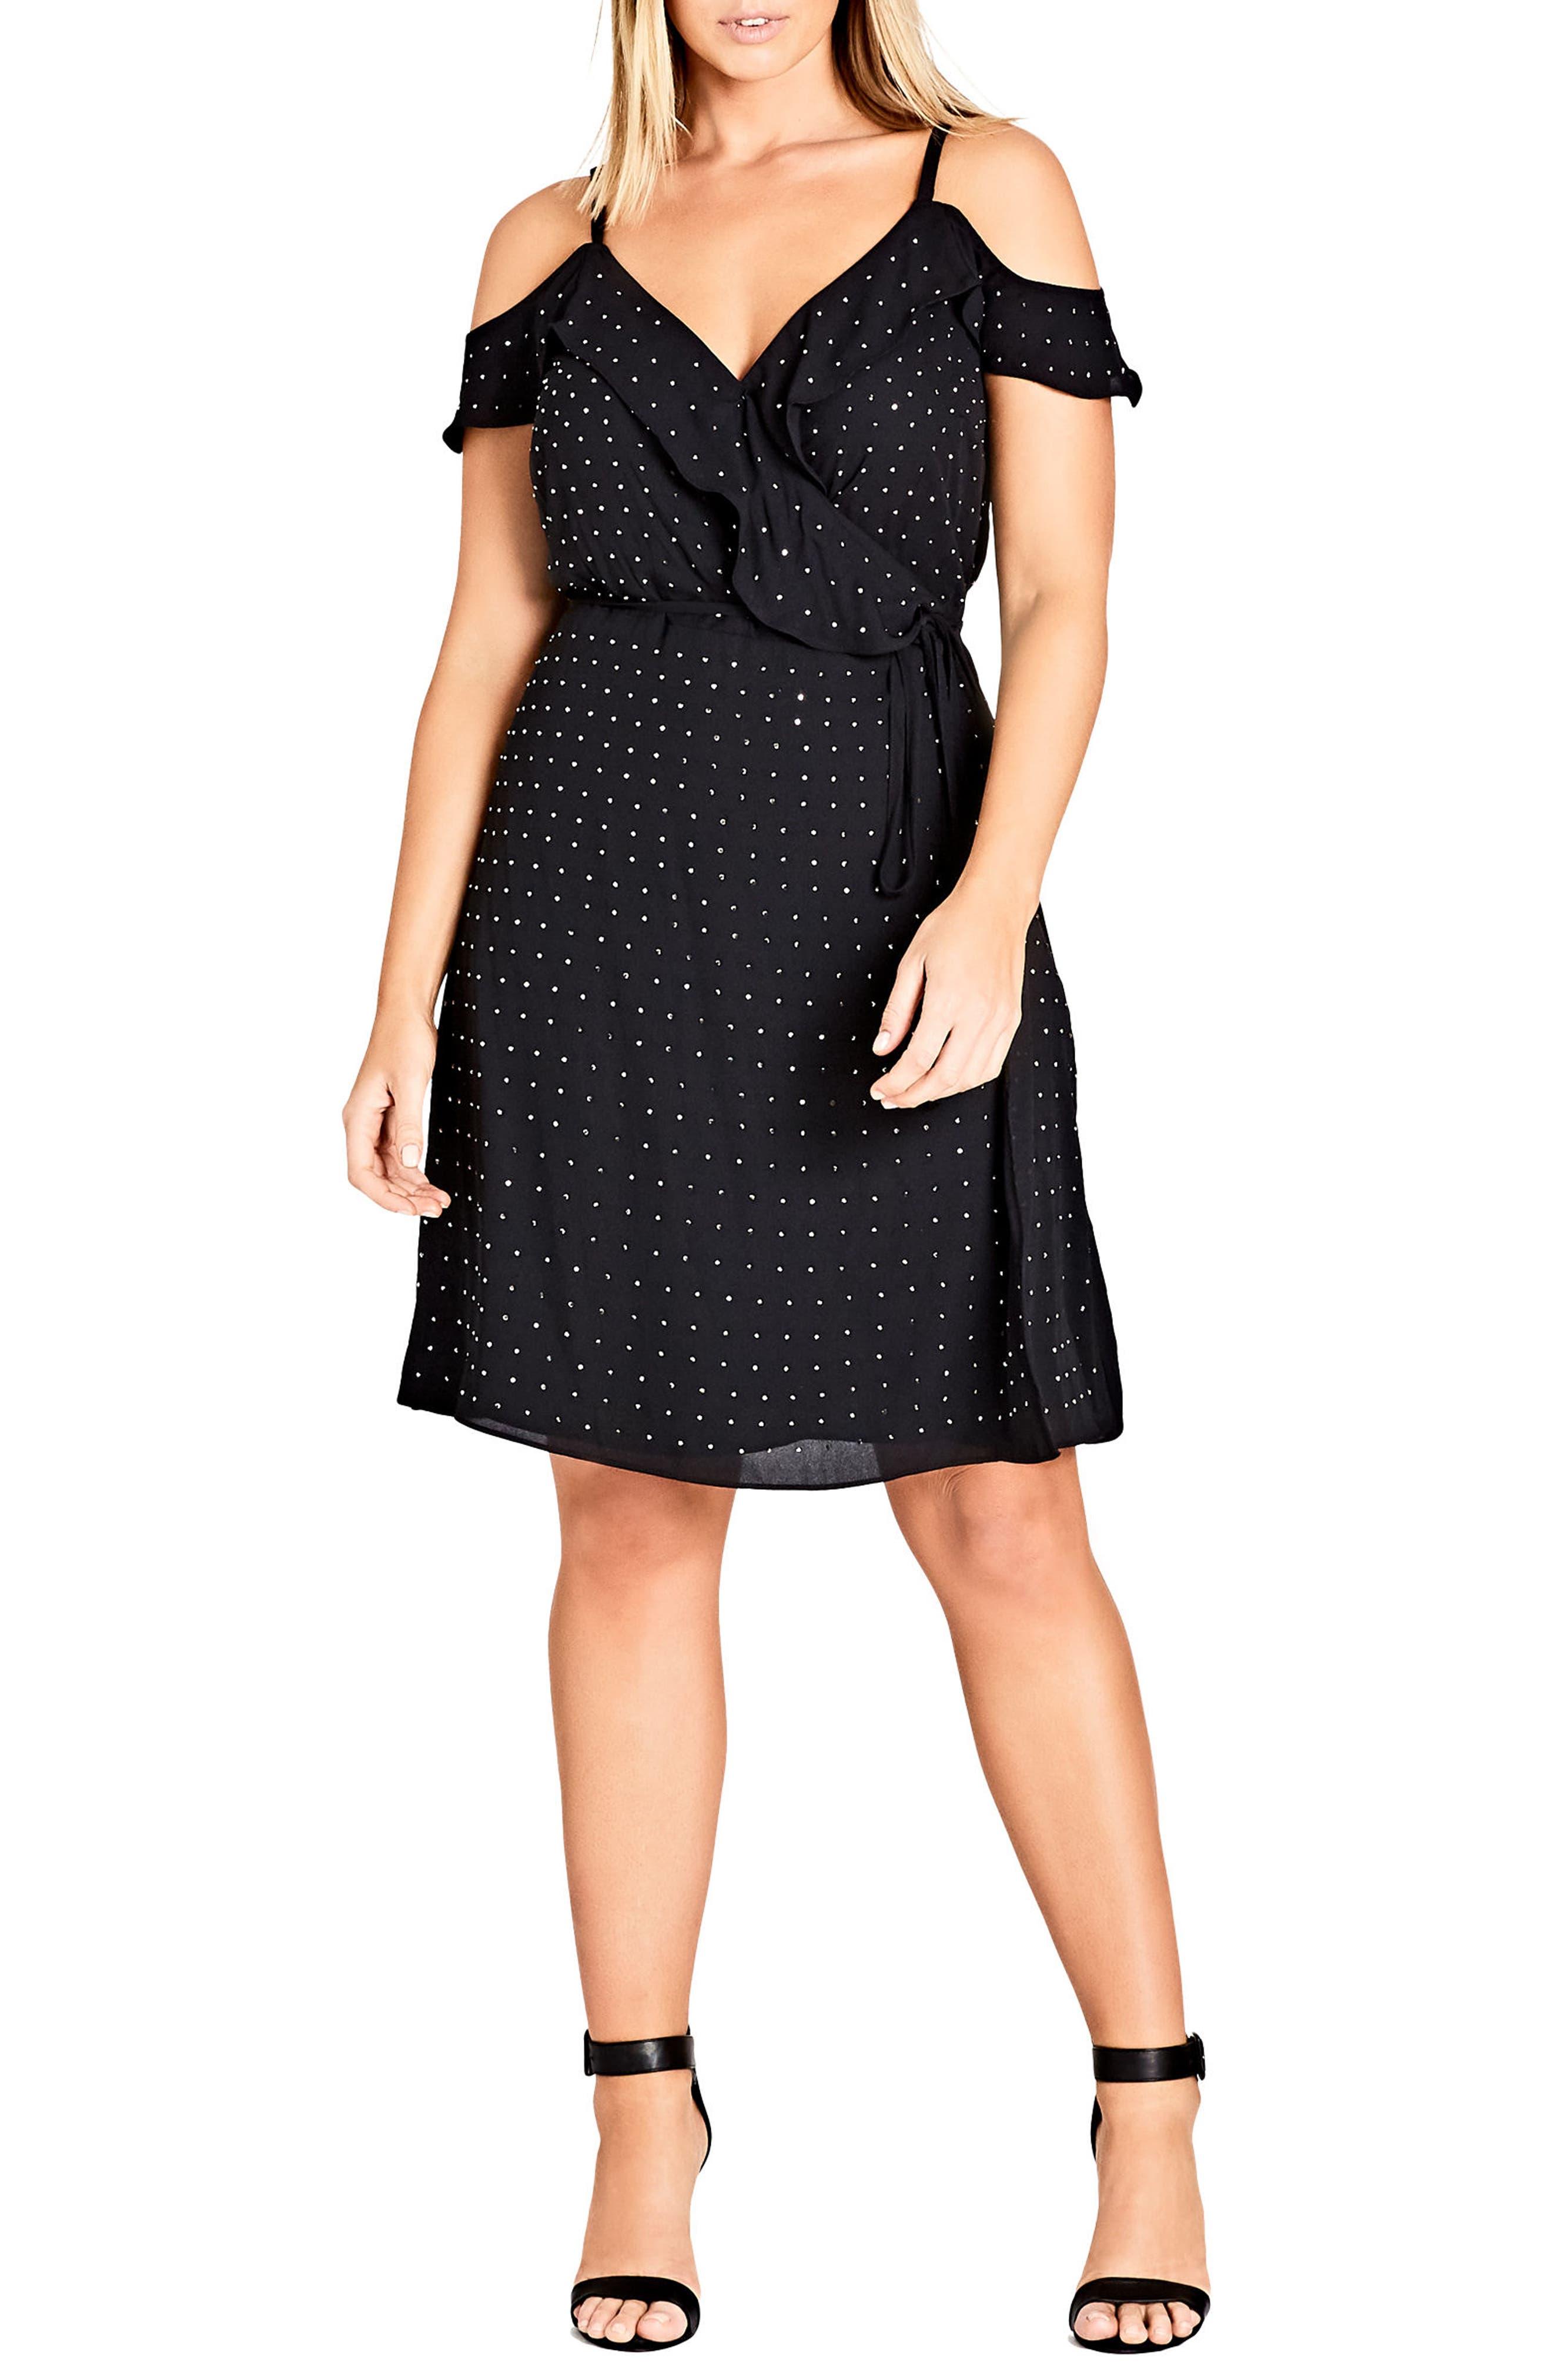 Flirty Bling Cold Shoulder Ruffle Fit & Flare Dress,                             Main thumbnail 1, color,                             001